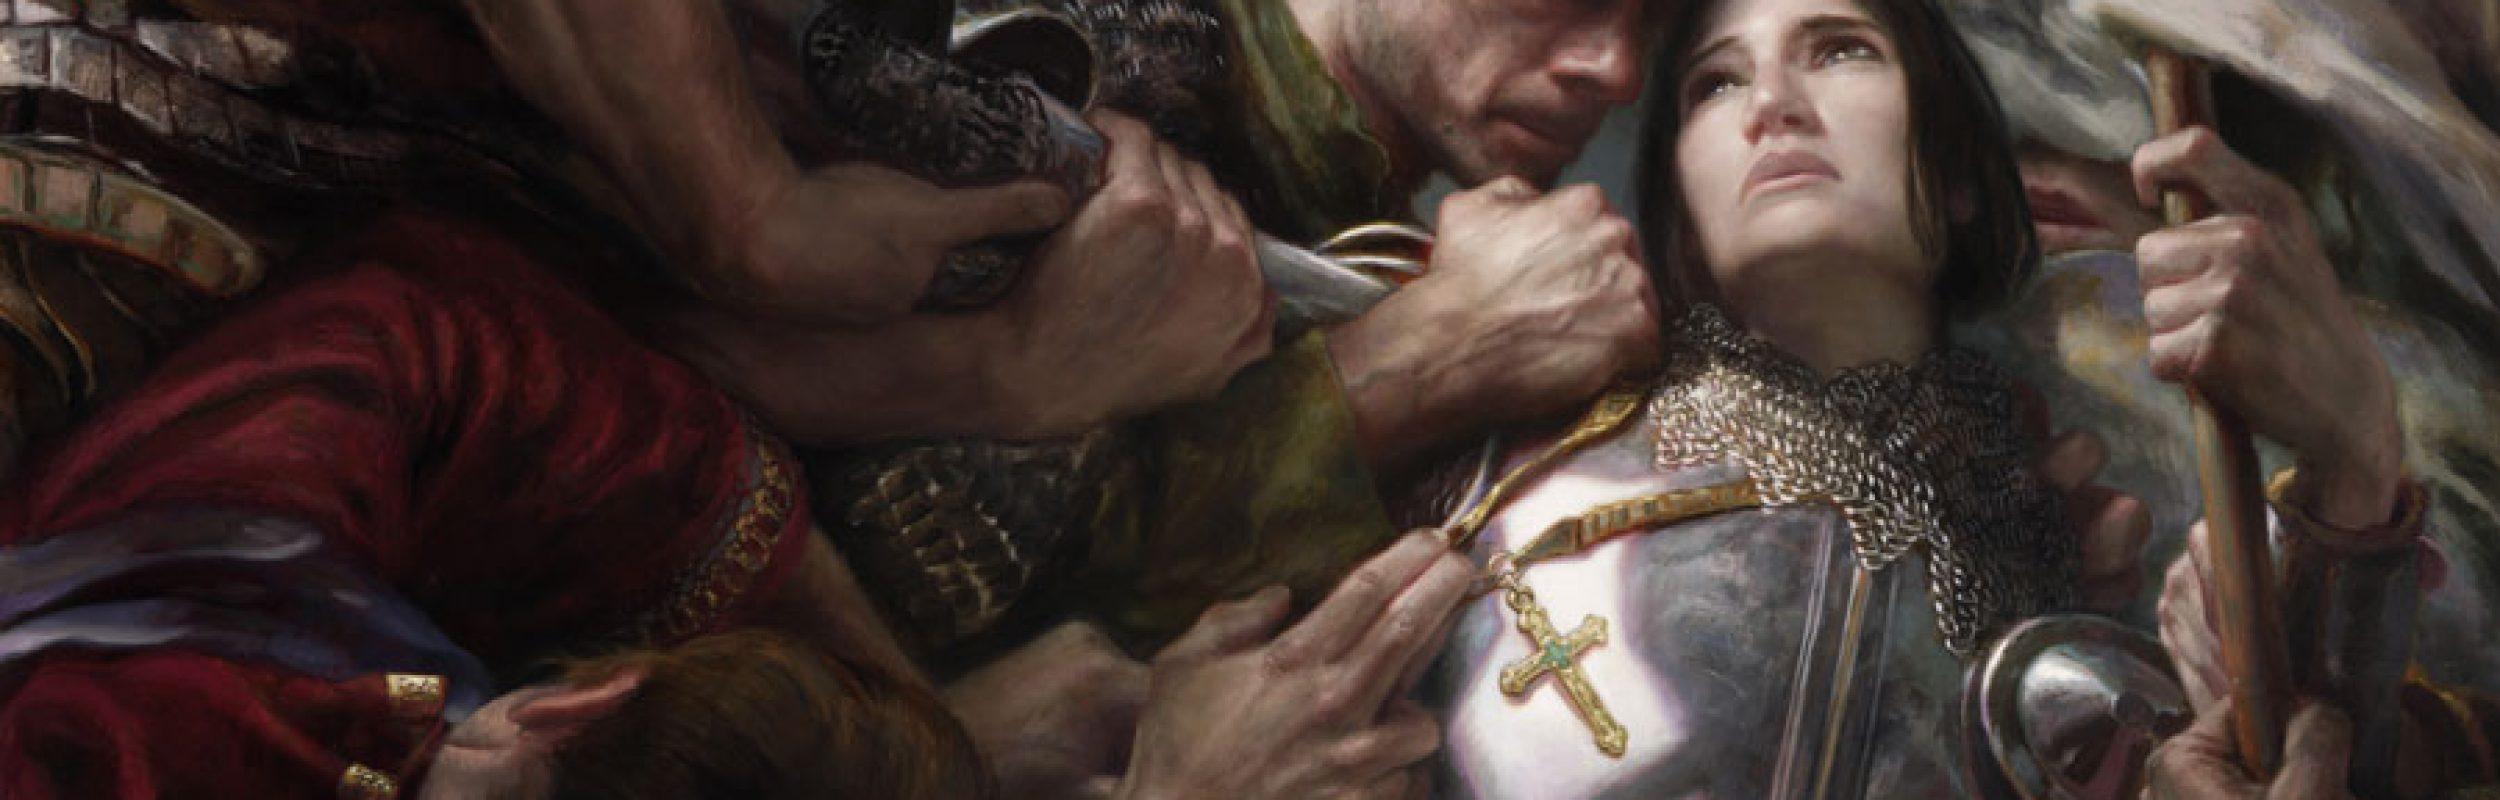 Juana de Arco : Canalizando a Dios o Cayendo en el Engaño